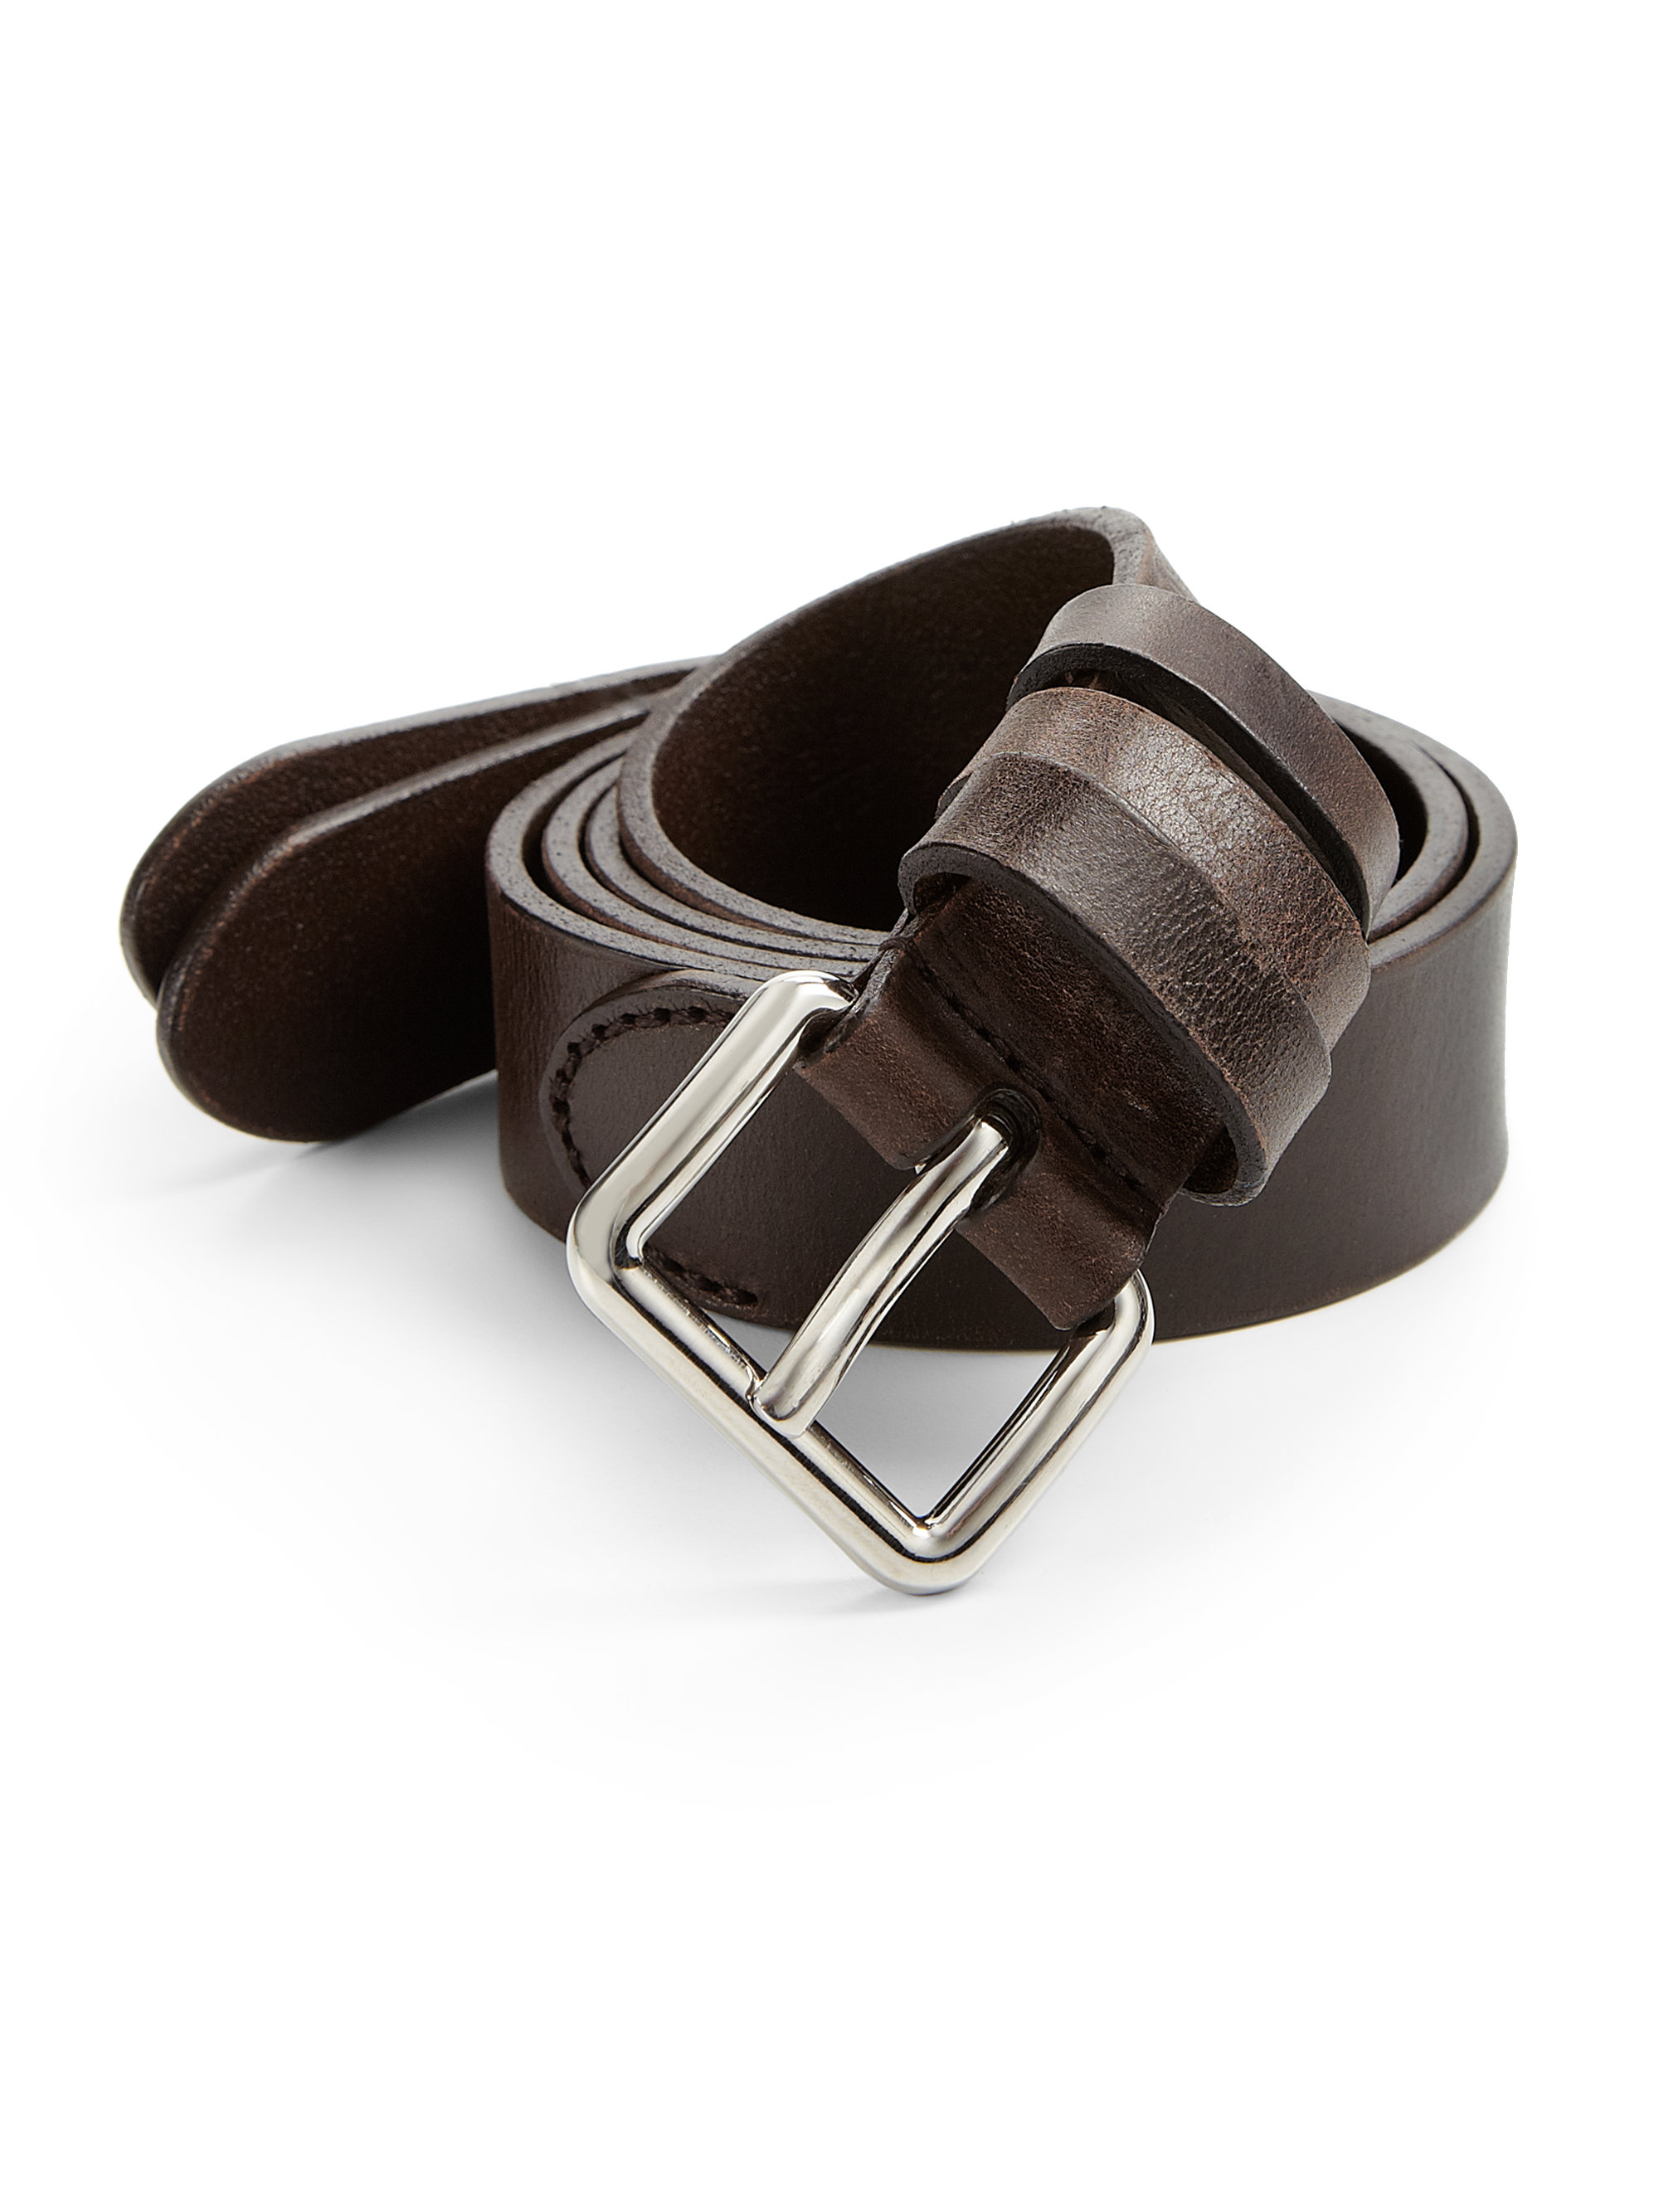 Prada Calfskin Leather Belt In Brown For Men